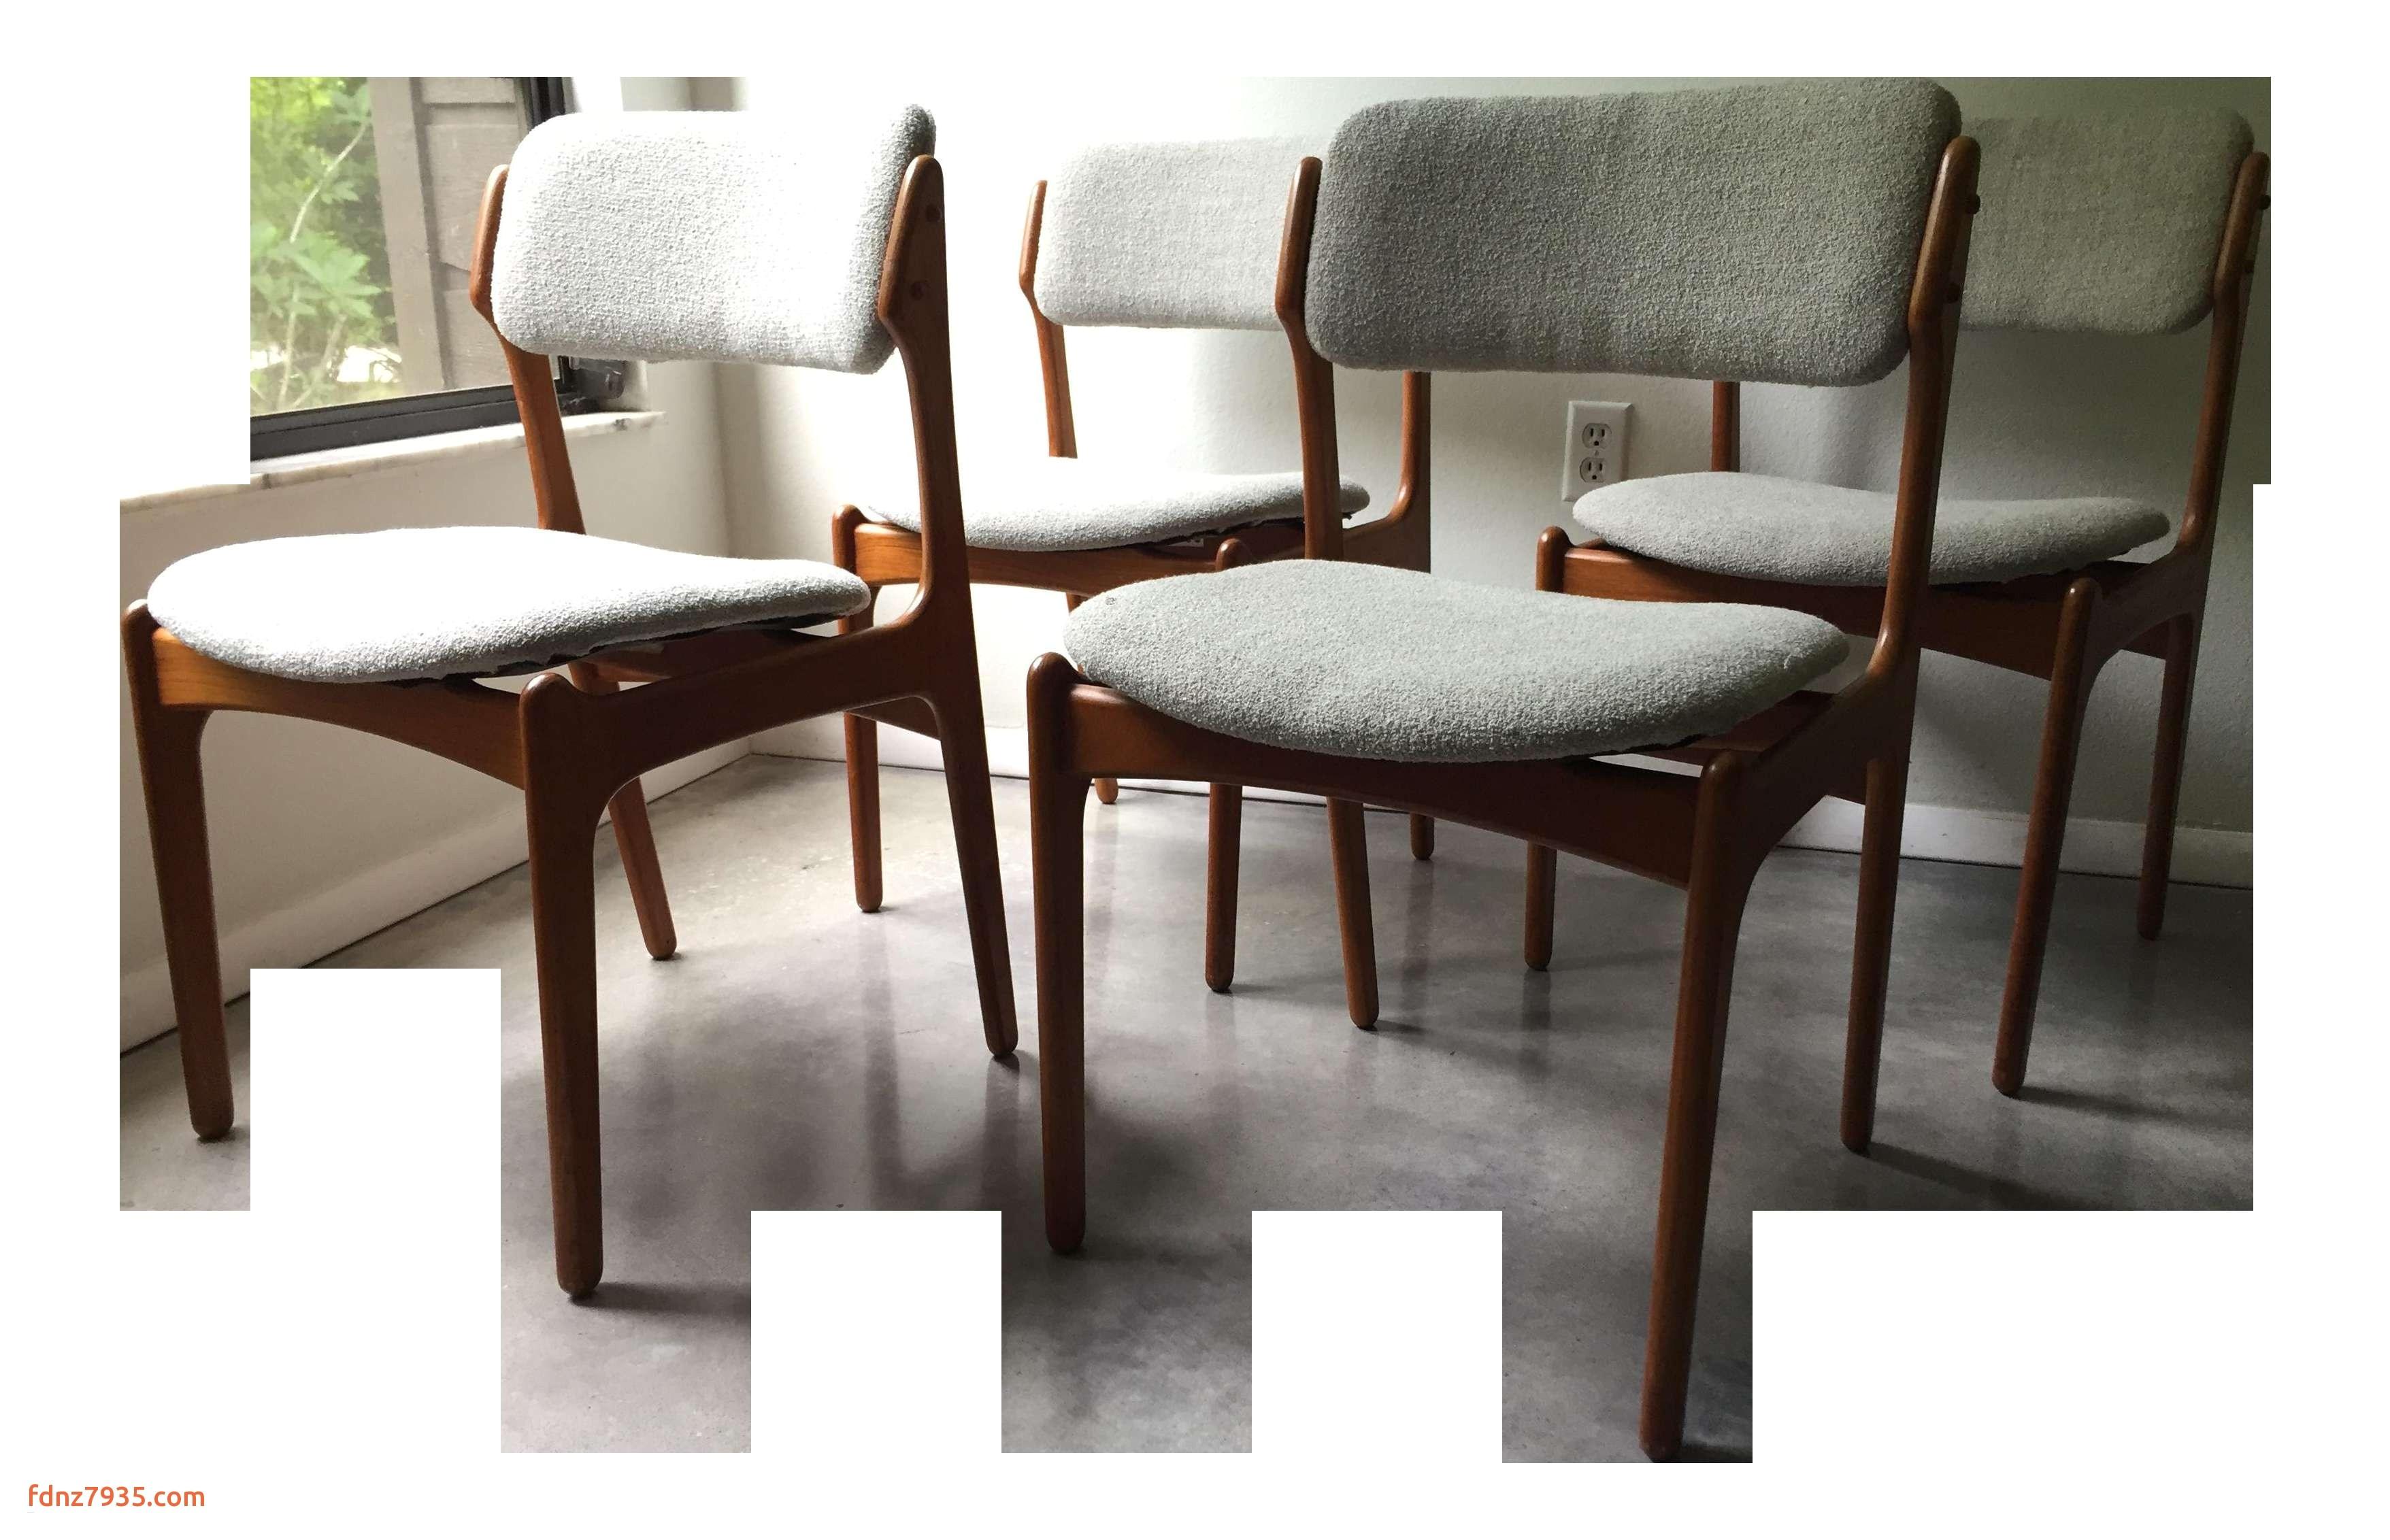 brown jordan outdoor furniture awesome vintage erik buck o d mobler danish dining chairs set 4 ideas